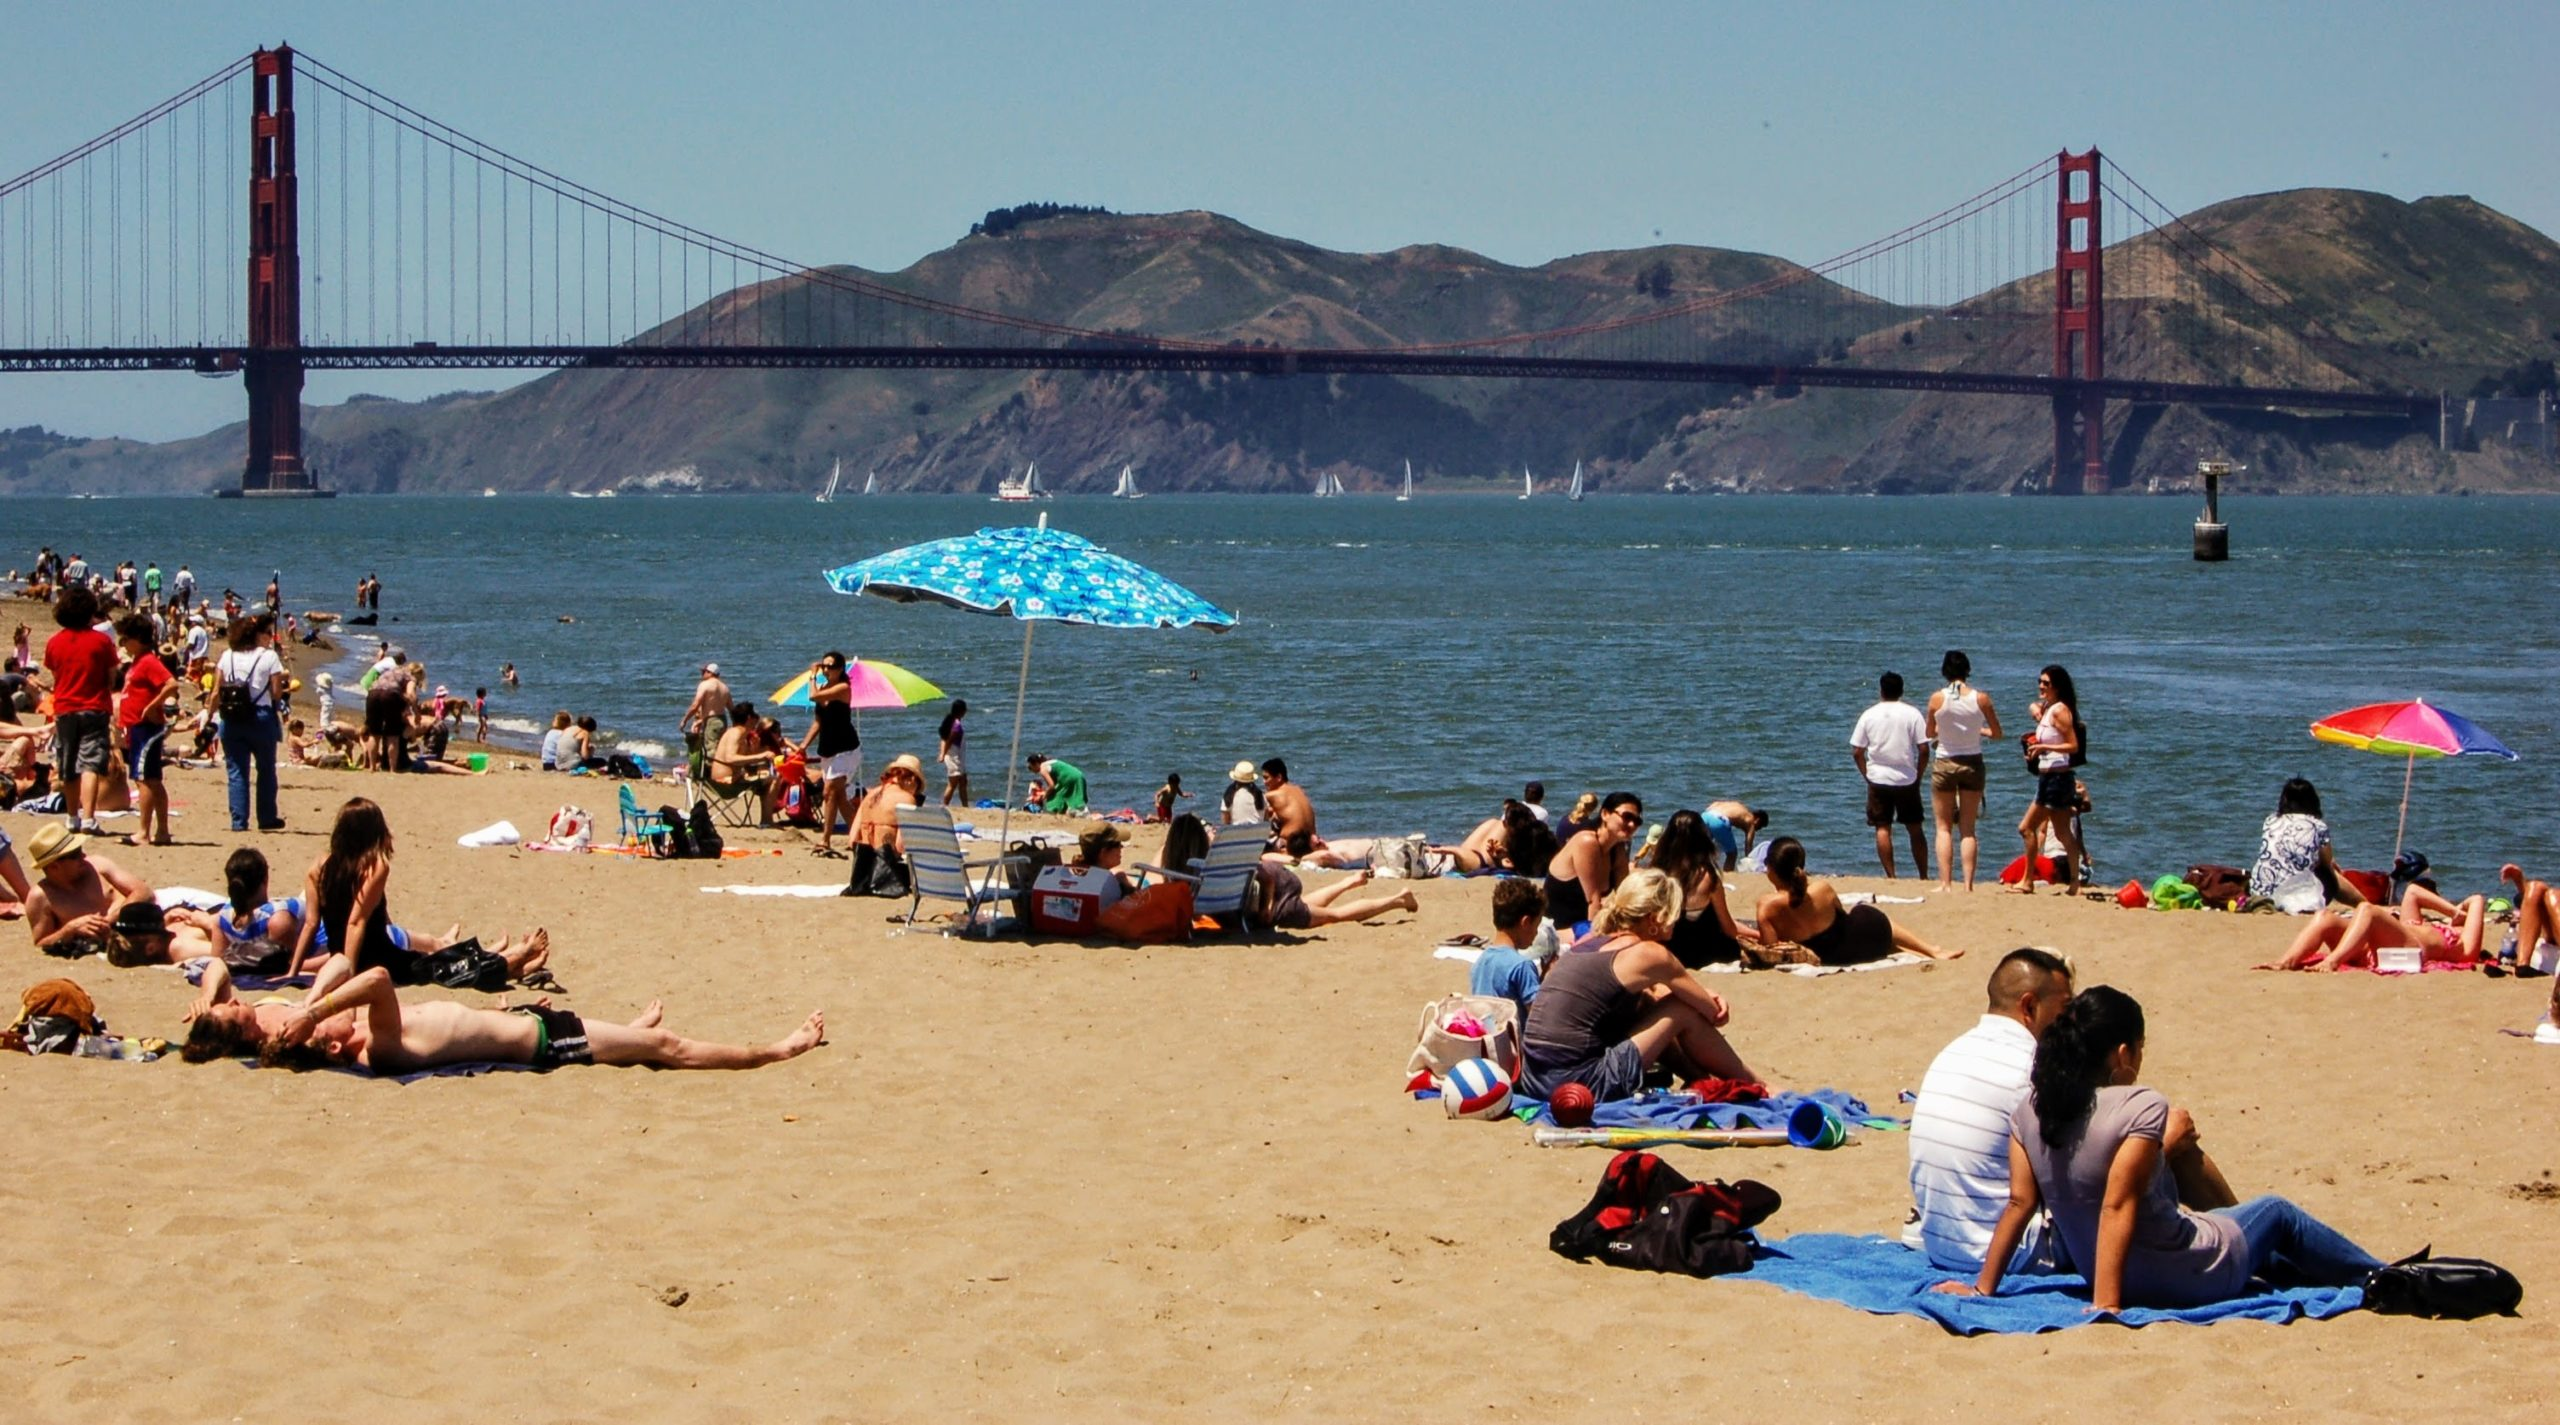 Crissy Field Beach, San Francisco